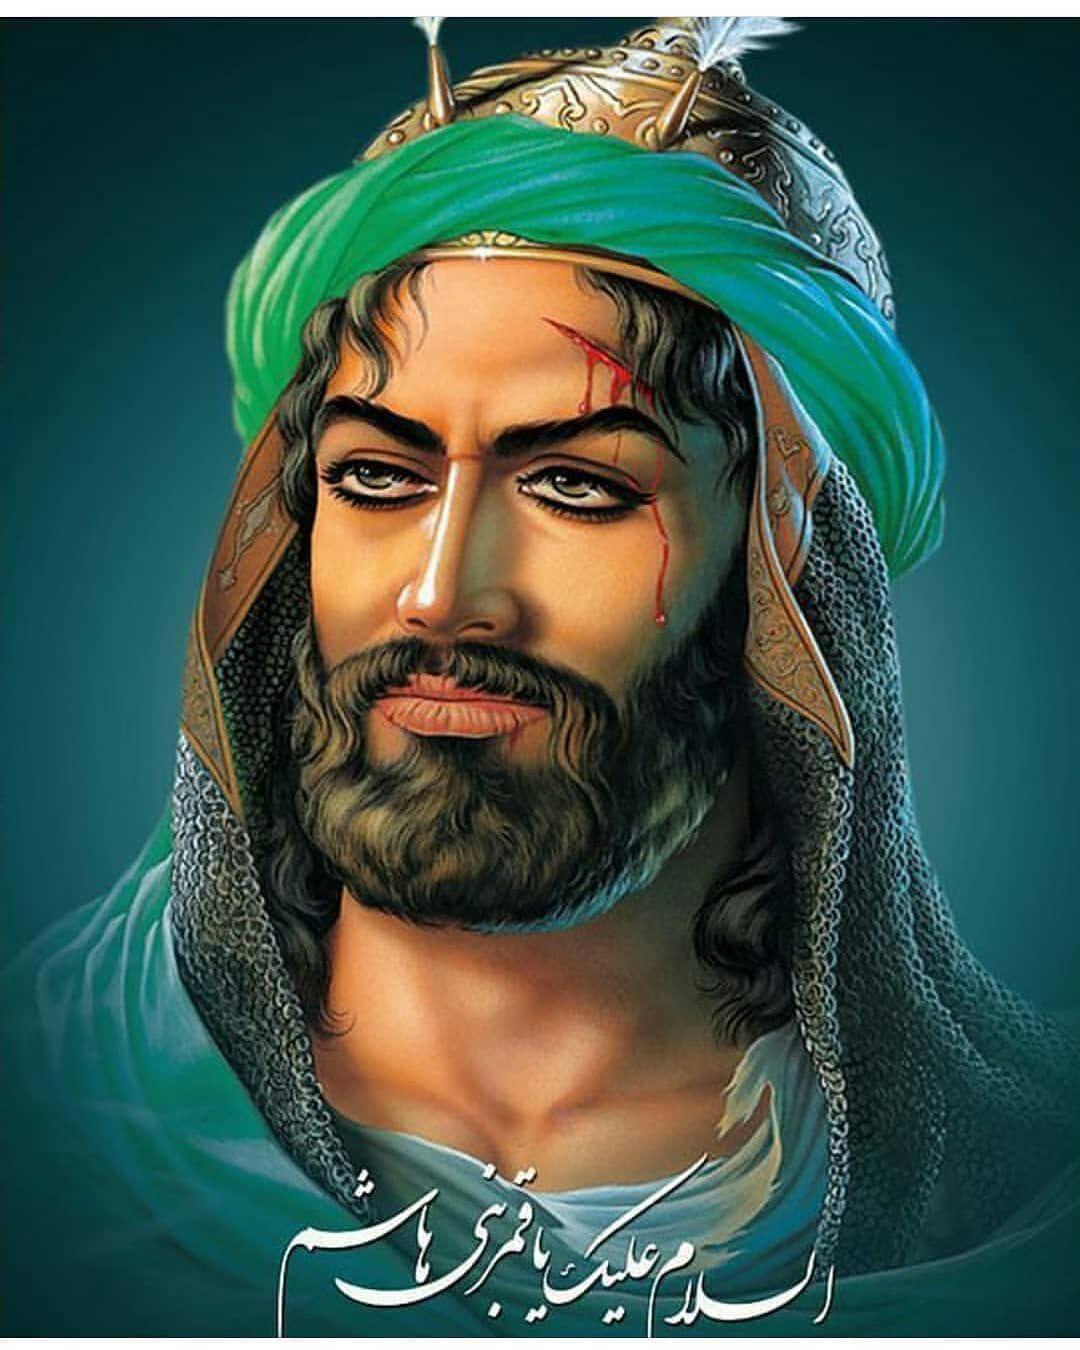 Instagram Beitrag Von Azerbaycan Yusif Məhəbbət Feb 16 2019 Um 7 19 Utc Karbala Photography Islamic Paintings Islamic Pictures